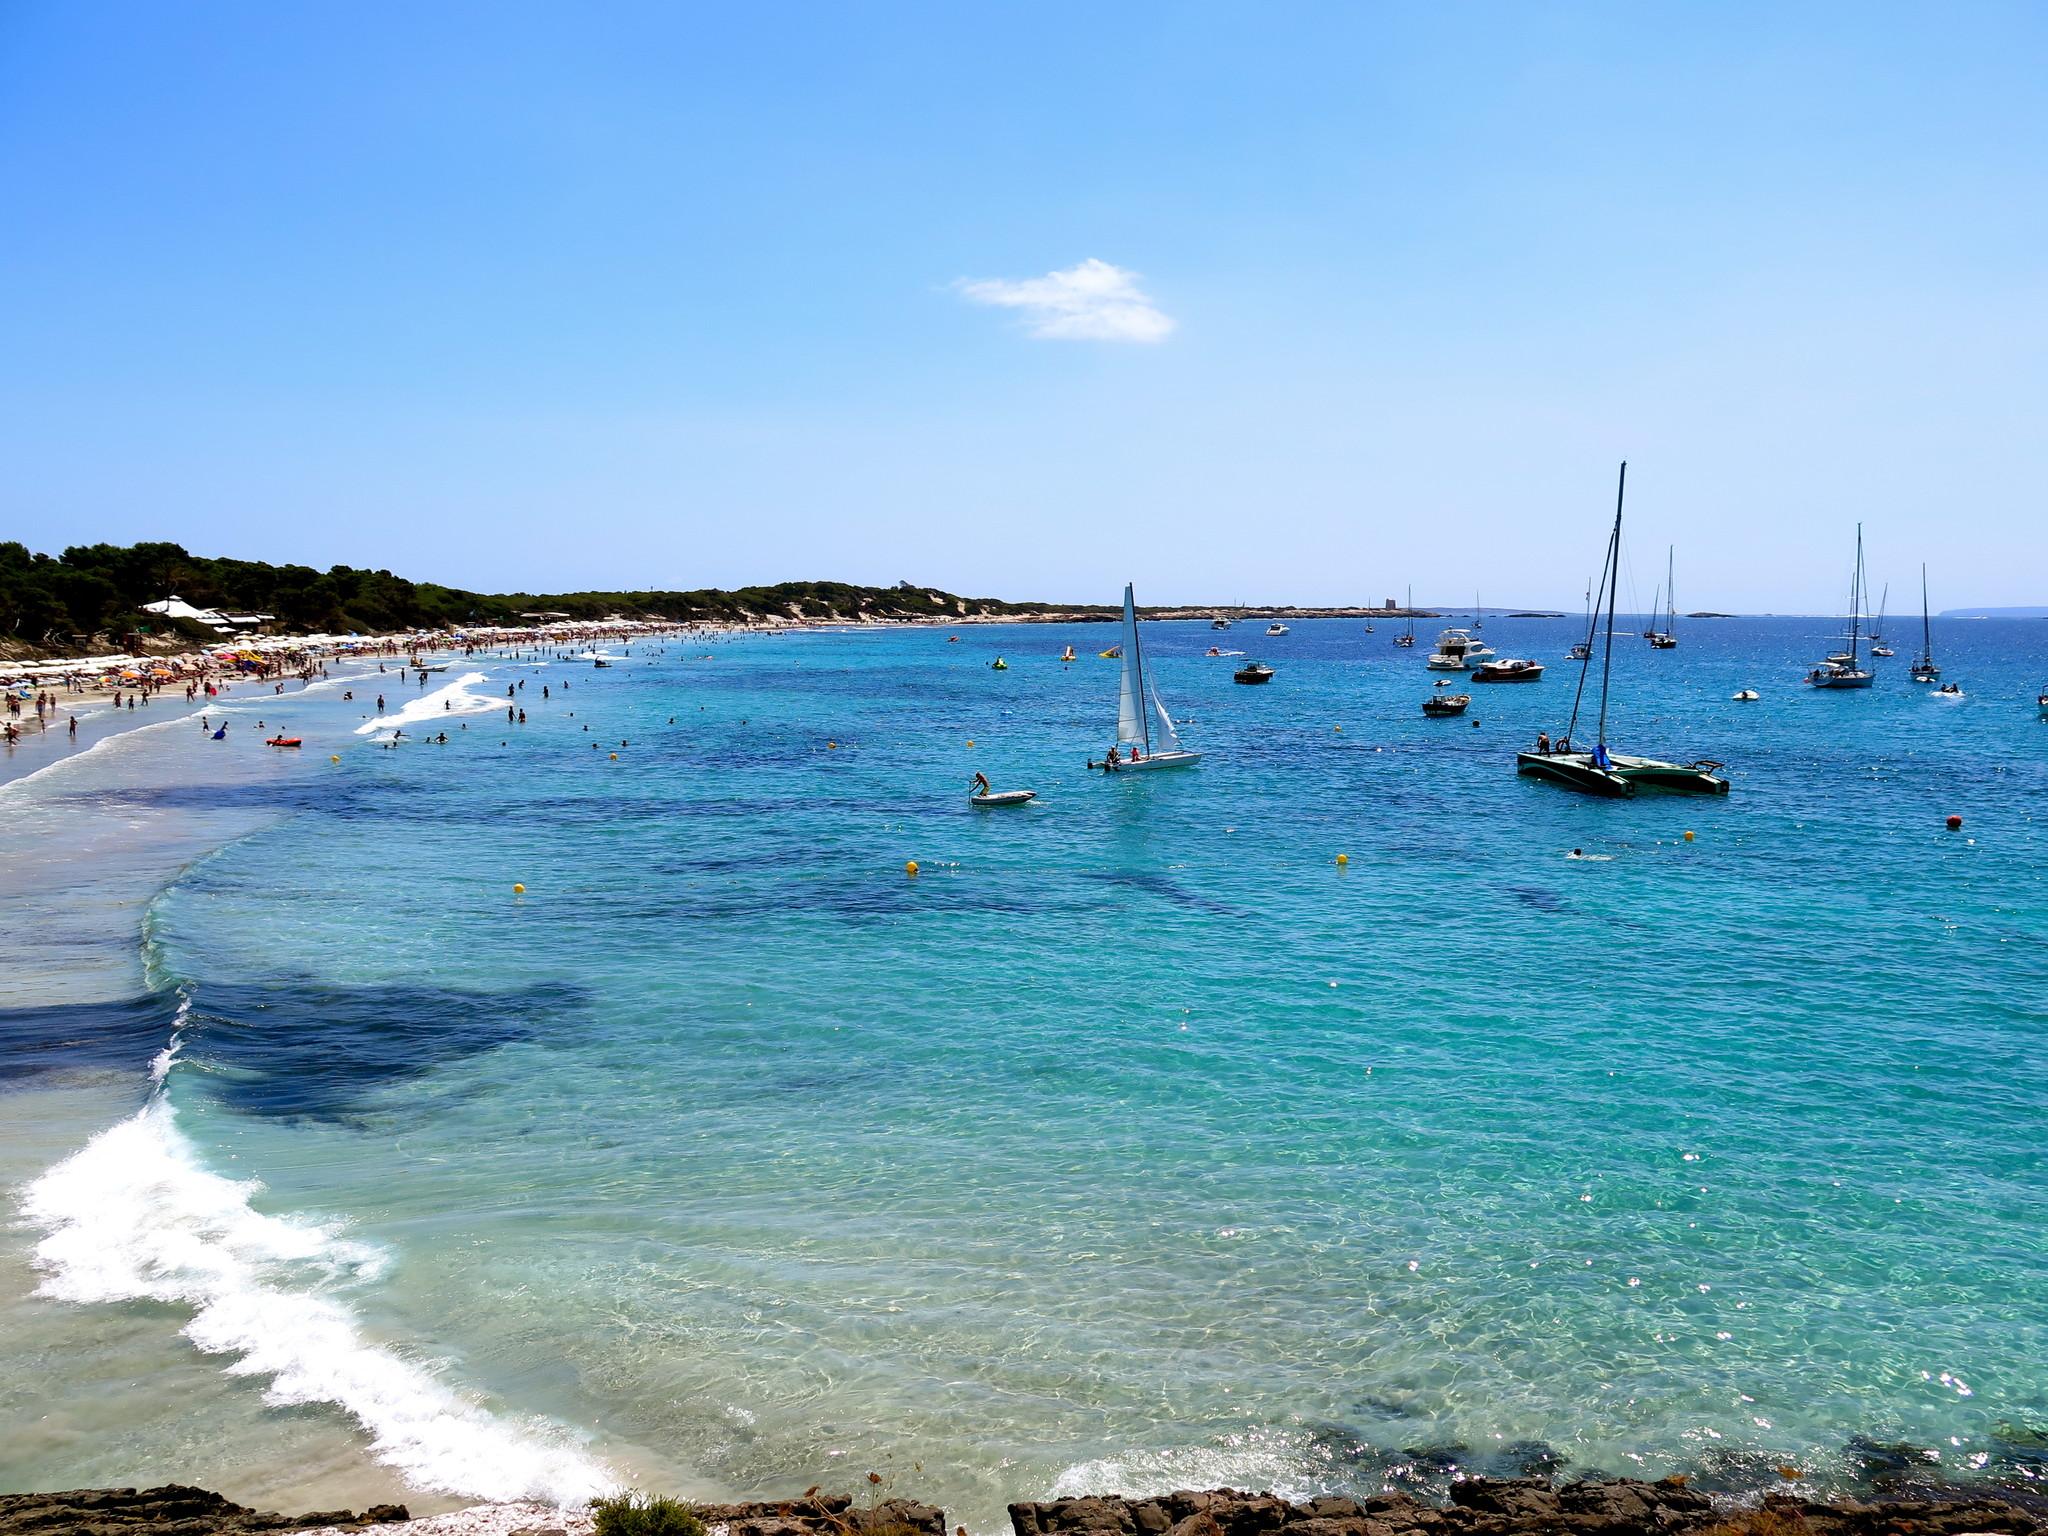 La spiaggia di Las Salinas a Ibiza